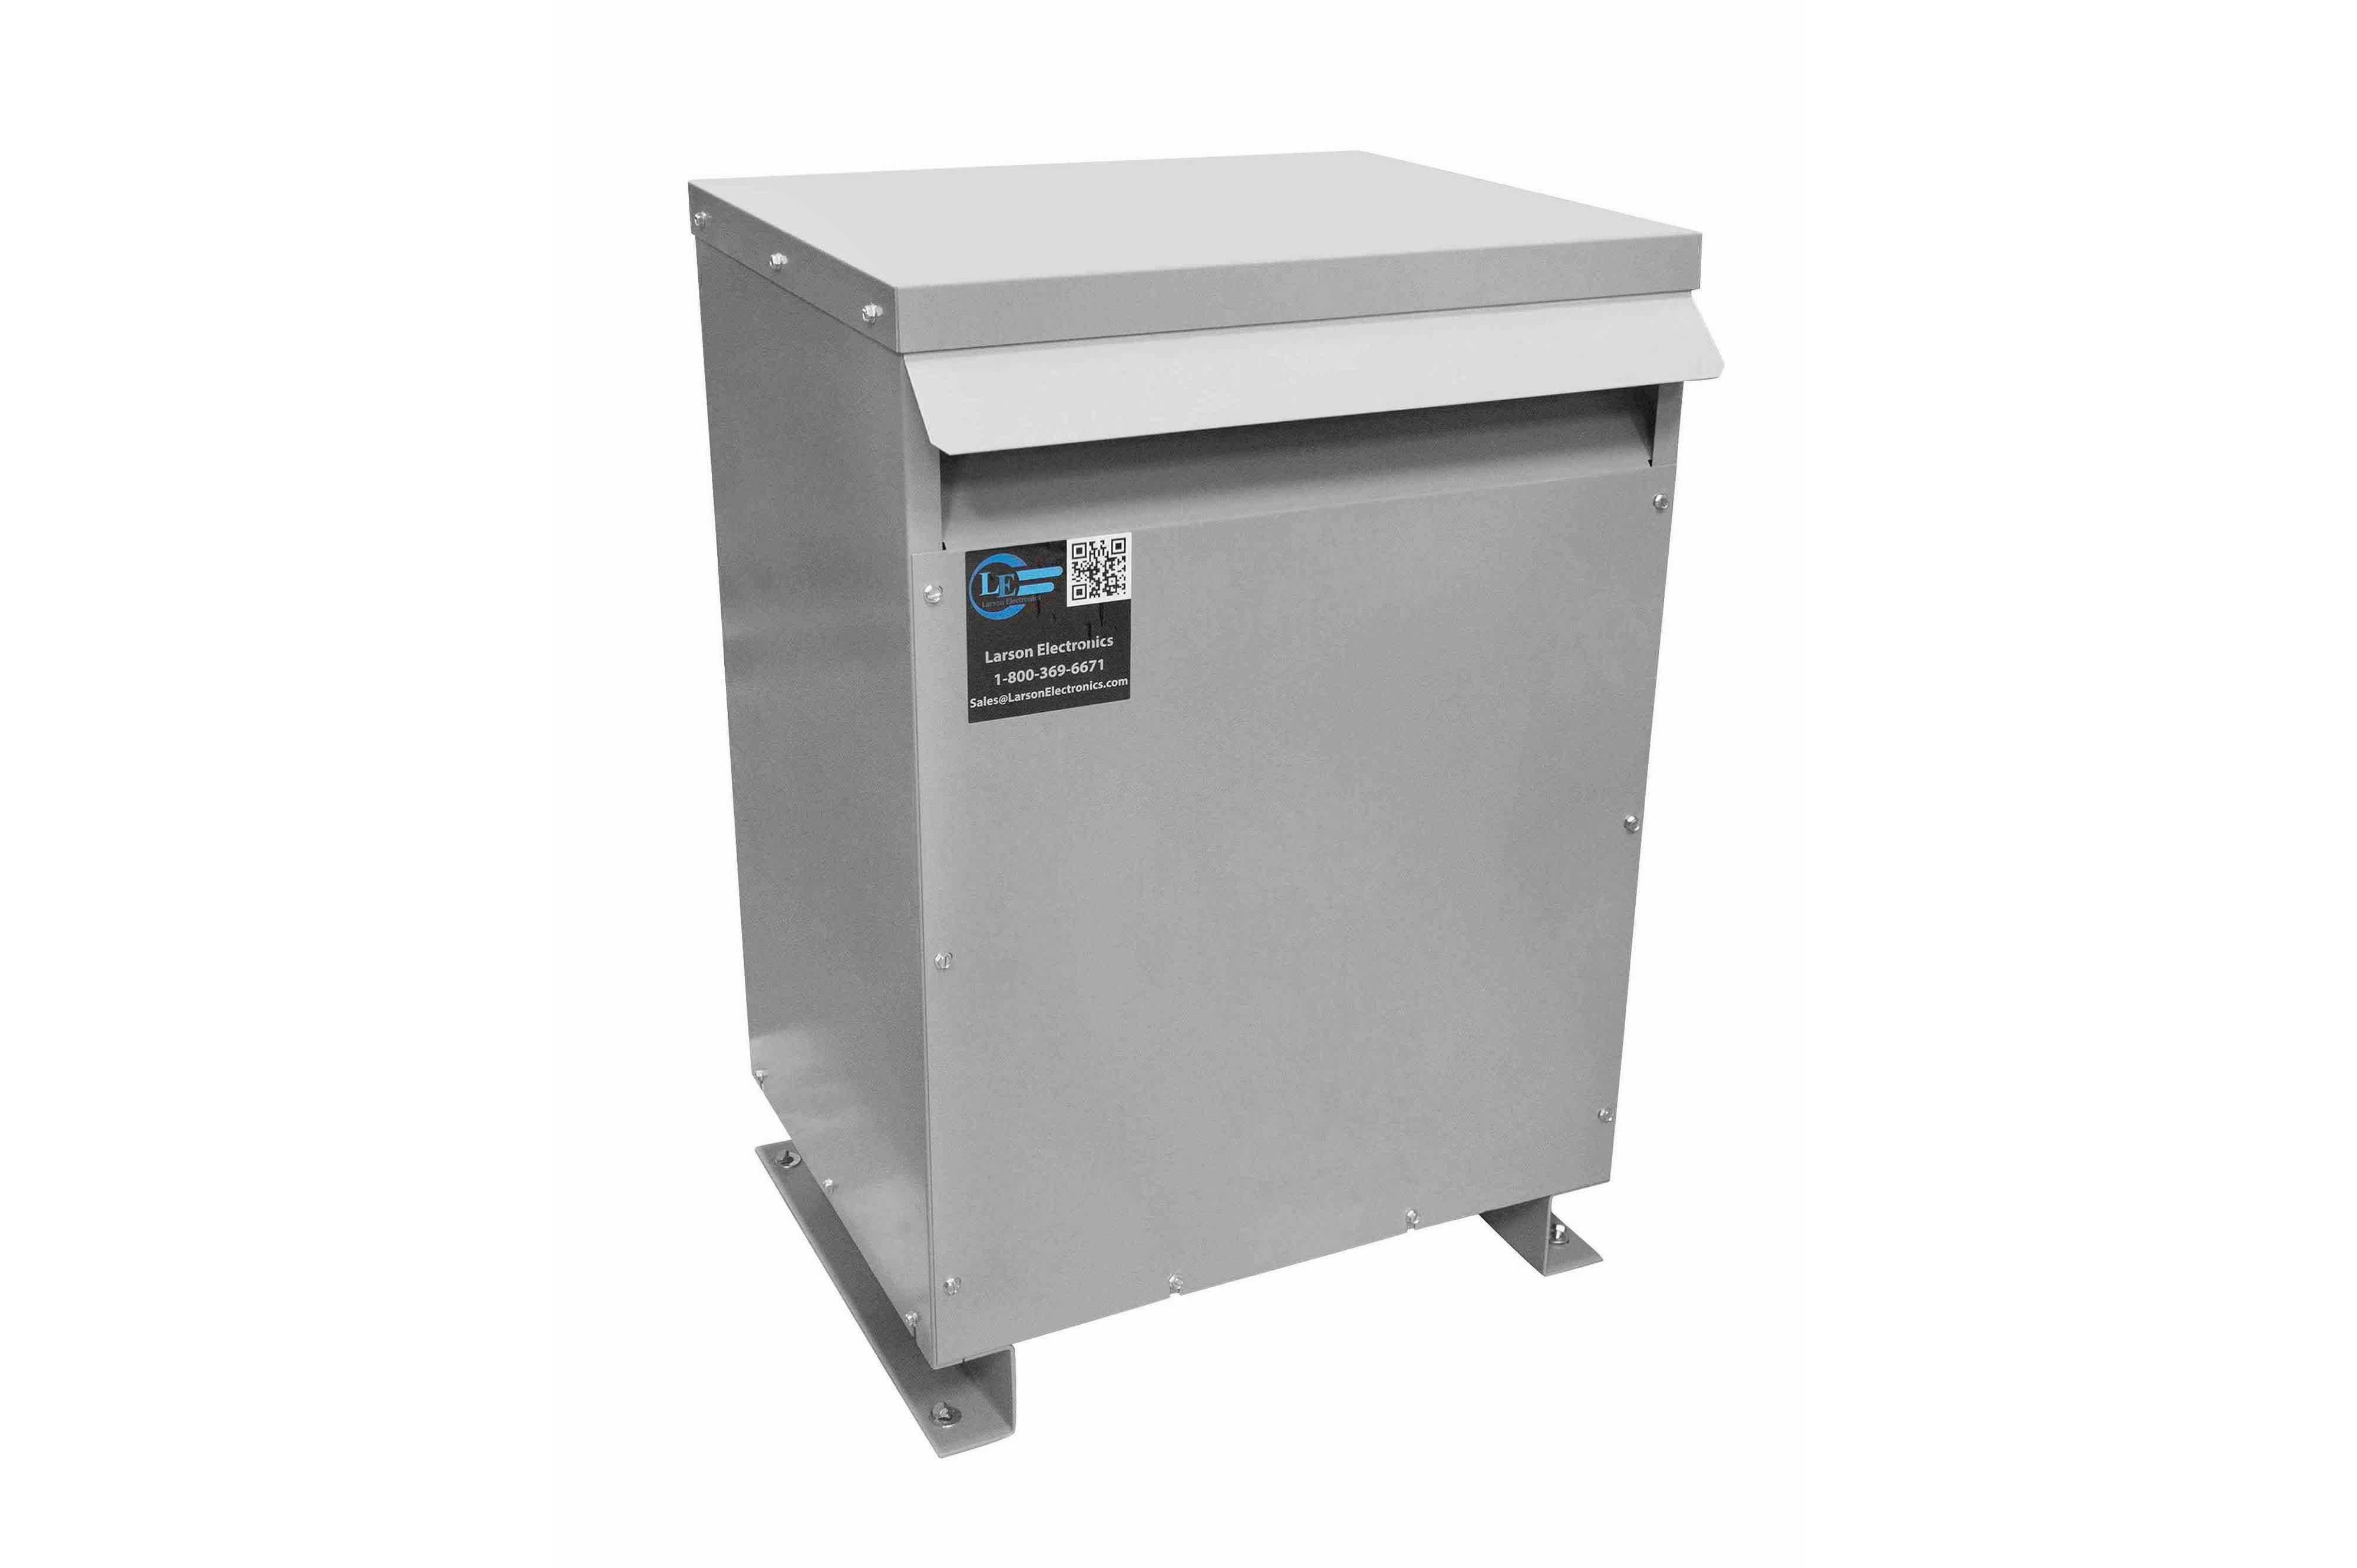 36 kVA 3PH DOE Transformer, 208V Delta Primary, 480Y/277 Wye-N Secondary, N3R, Ventilated, 60 Hz